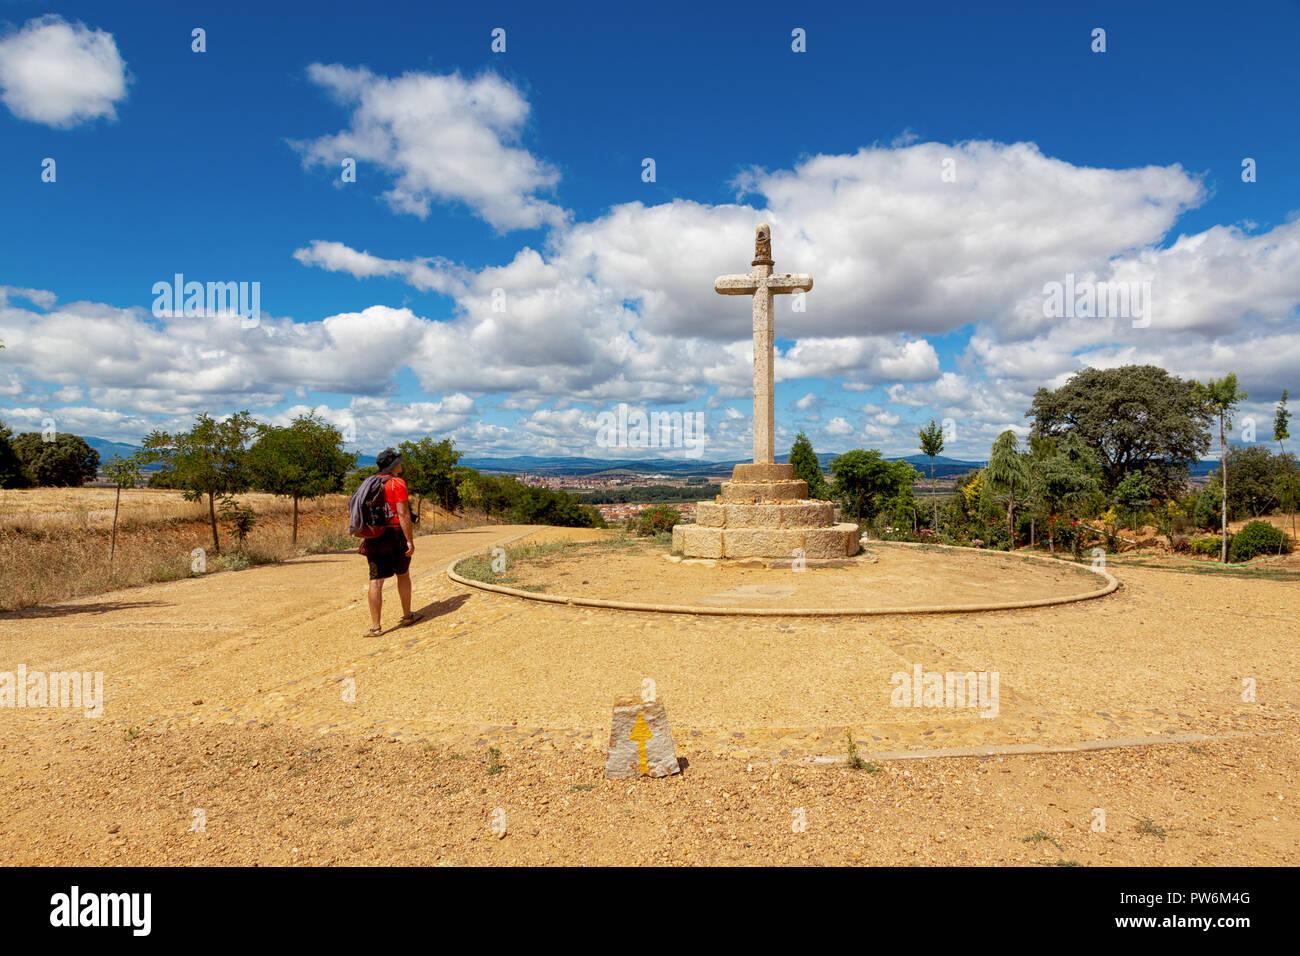 Camino de Santiago (Spain) - The Santo Toribio stone cross and a pilgrim walking along the way of St.James, near Astorga - Stock Image